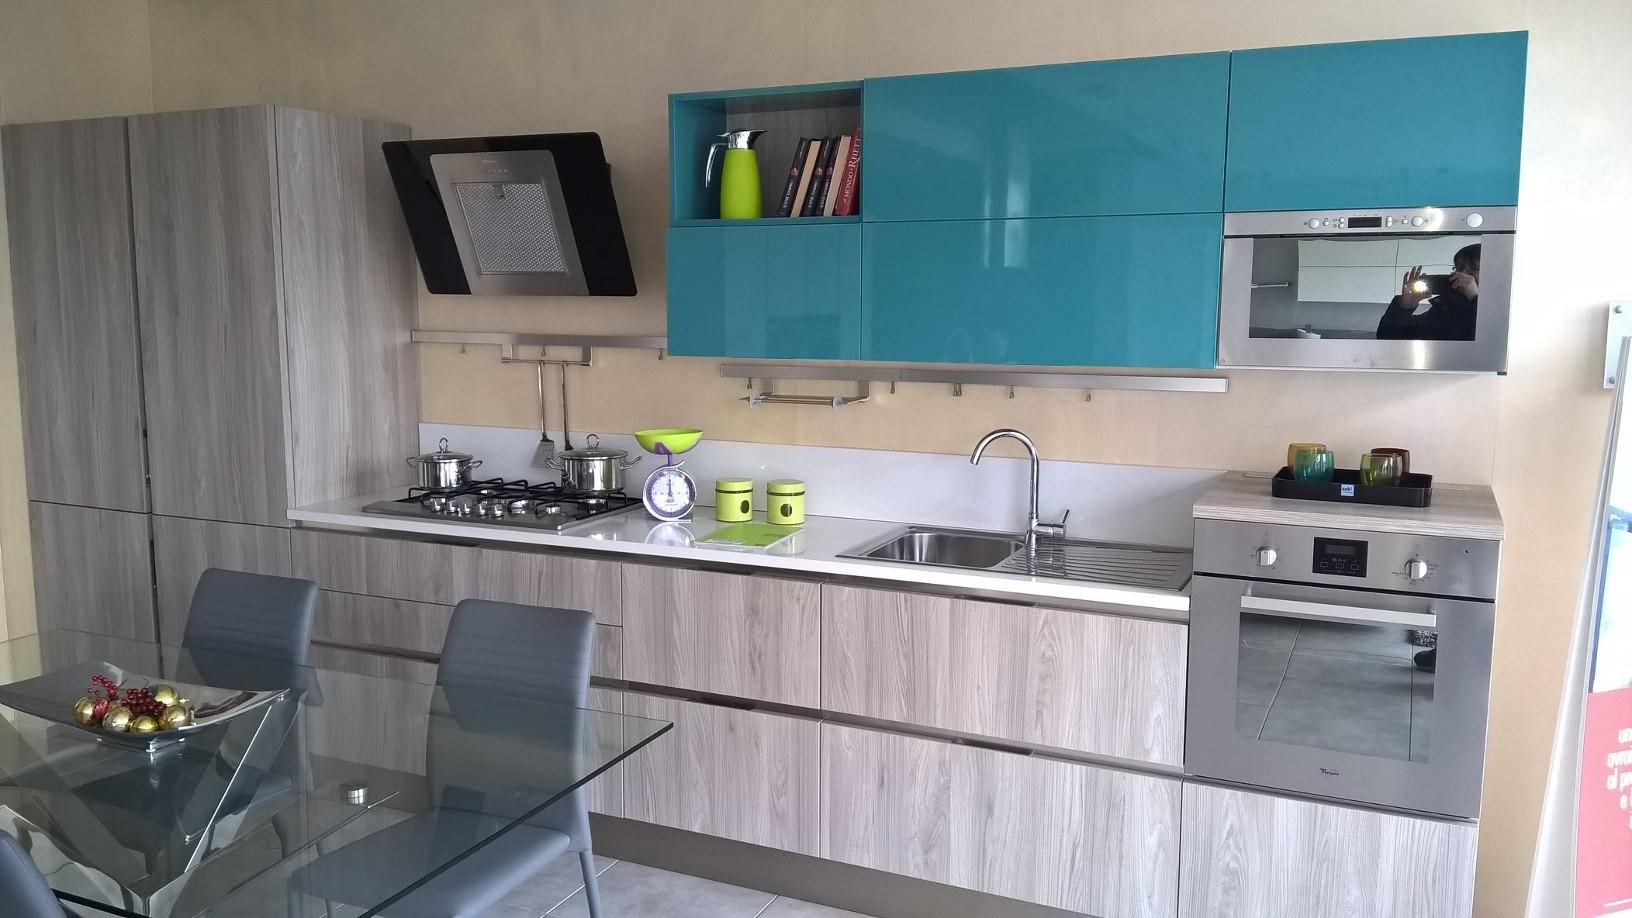 Veneta Cucine Cucina Start Time.go 28 Scontato Del  51 % Cucine A  #387788 1632 918 Veneta Cucine O Arredo3